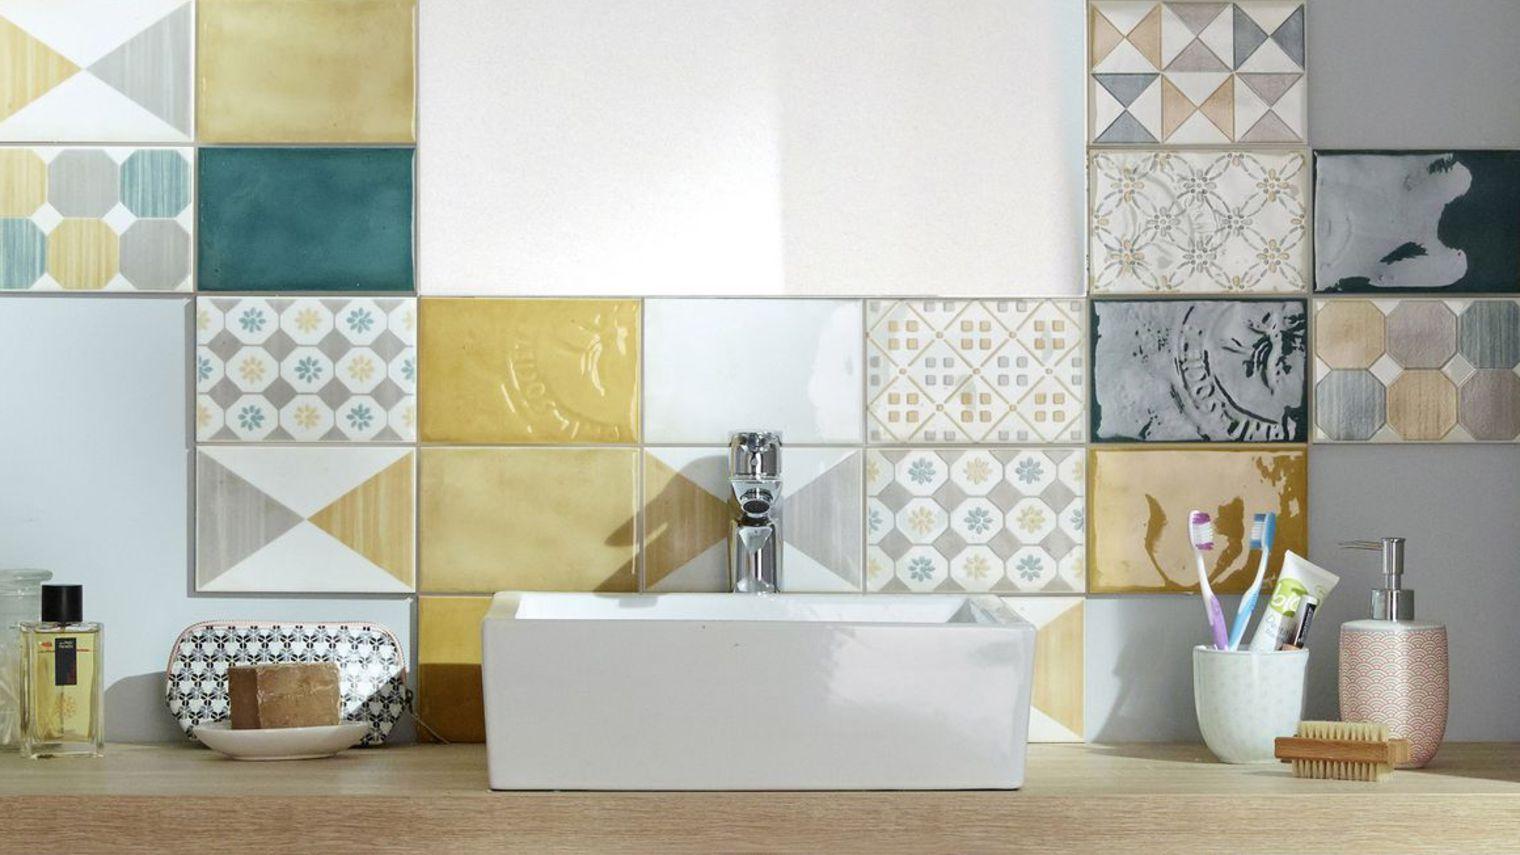 Carrelage Mosaique Castorama Beau Stock élégant Kasanga Meuble Miroir Salle De Bain Castorama 8 Mosaique for